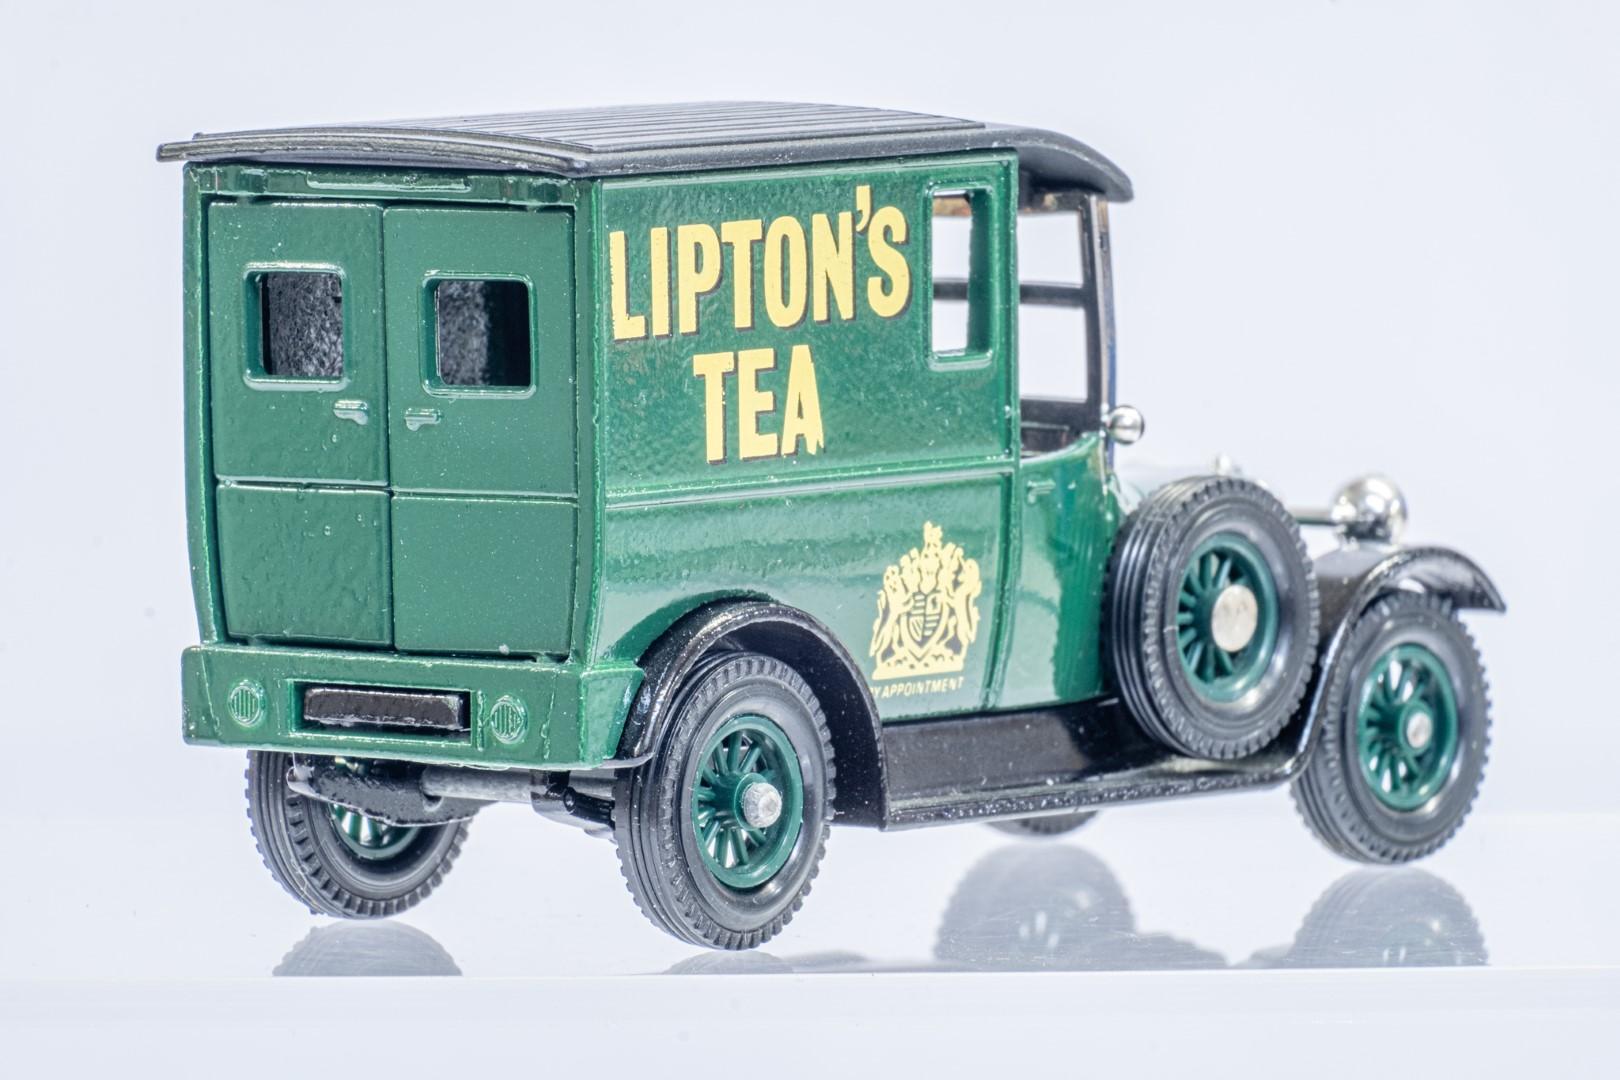 Matchbox 1927 Talbot Van Y-5 - Liptions Tea - Rare - Image 8 of 9